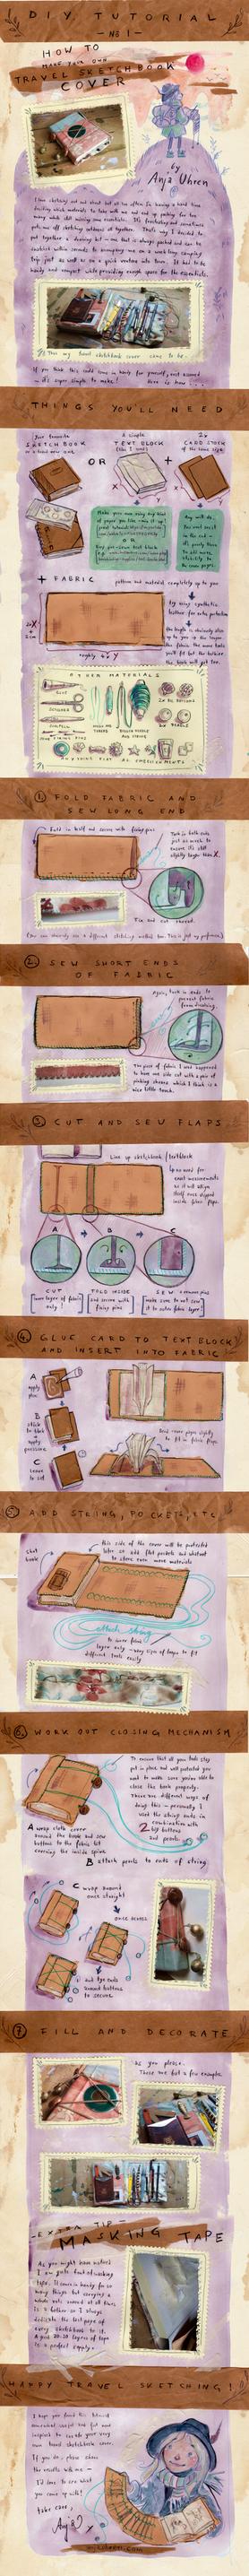 Tutorial - Travel Sketchbook Cover by anja-uhren